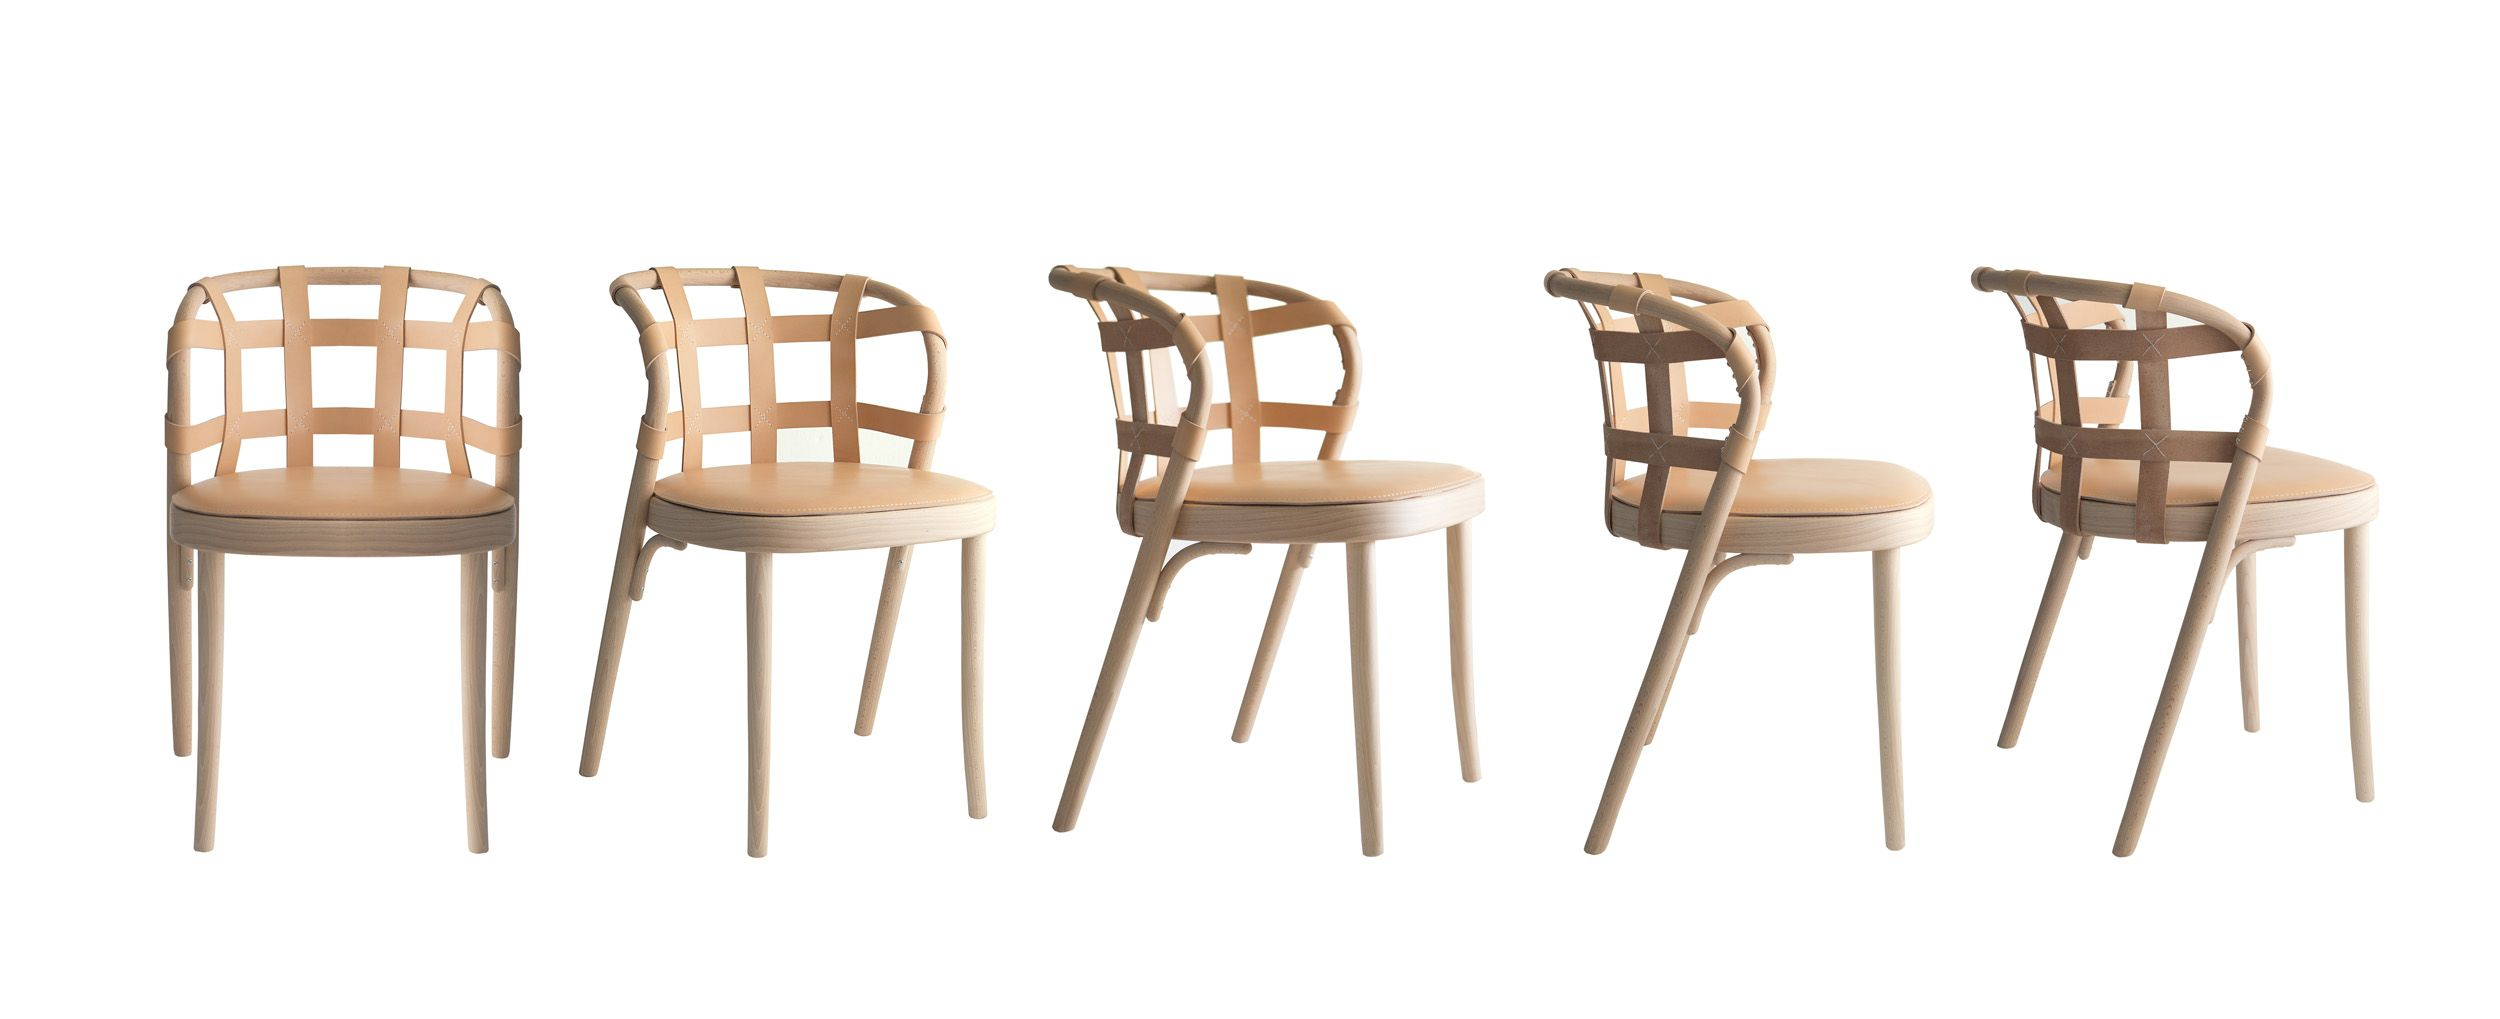 Hans Wegner Wishbone Chair Reproduction